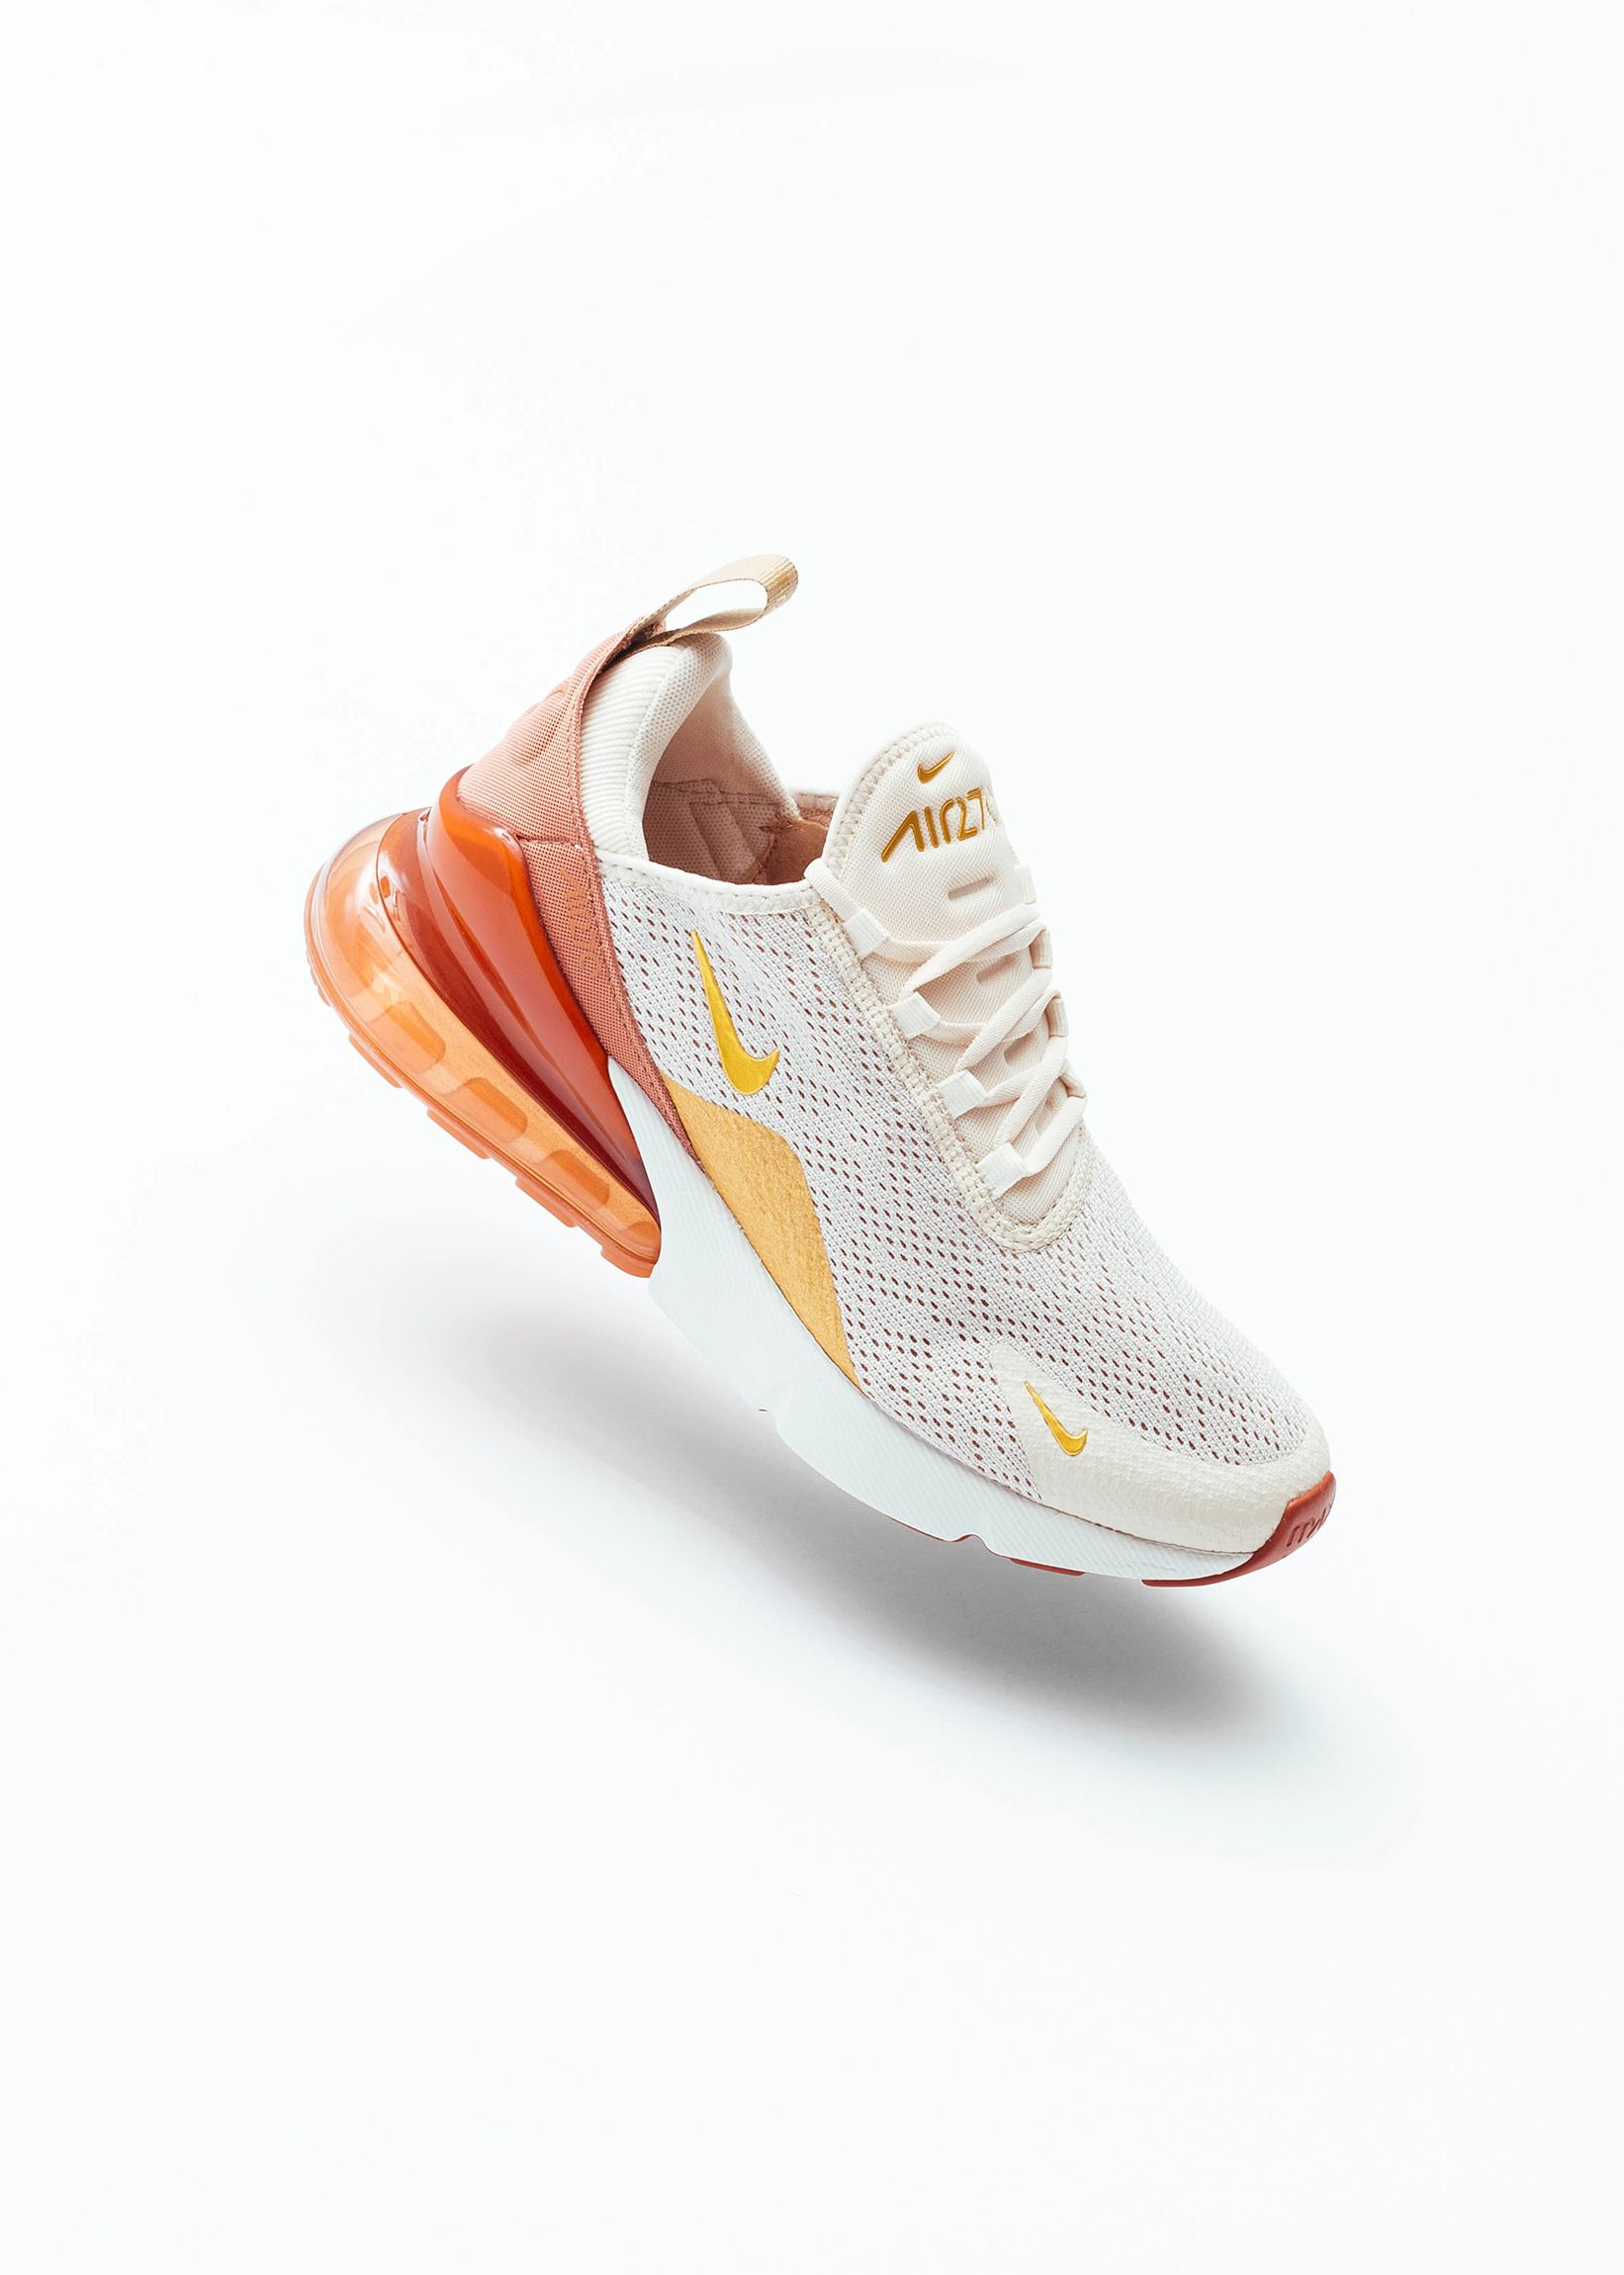 Nike Women's Air Max 270 Light Cream Metallic Gold Ah6789